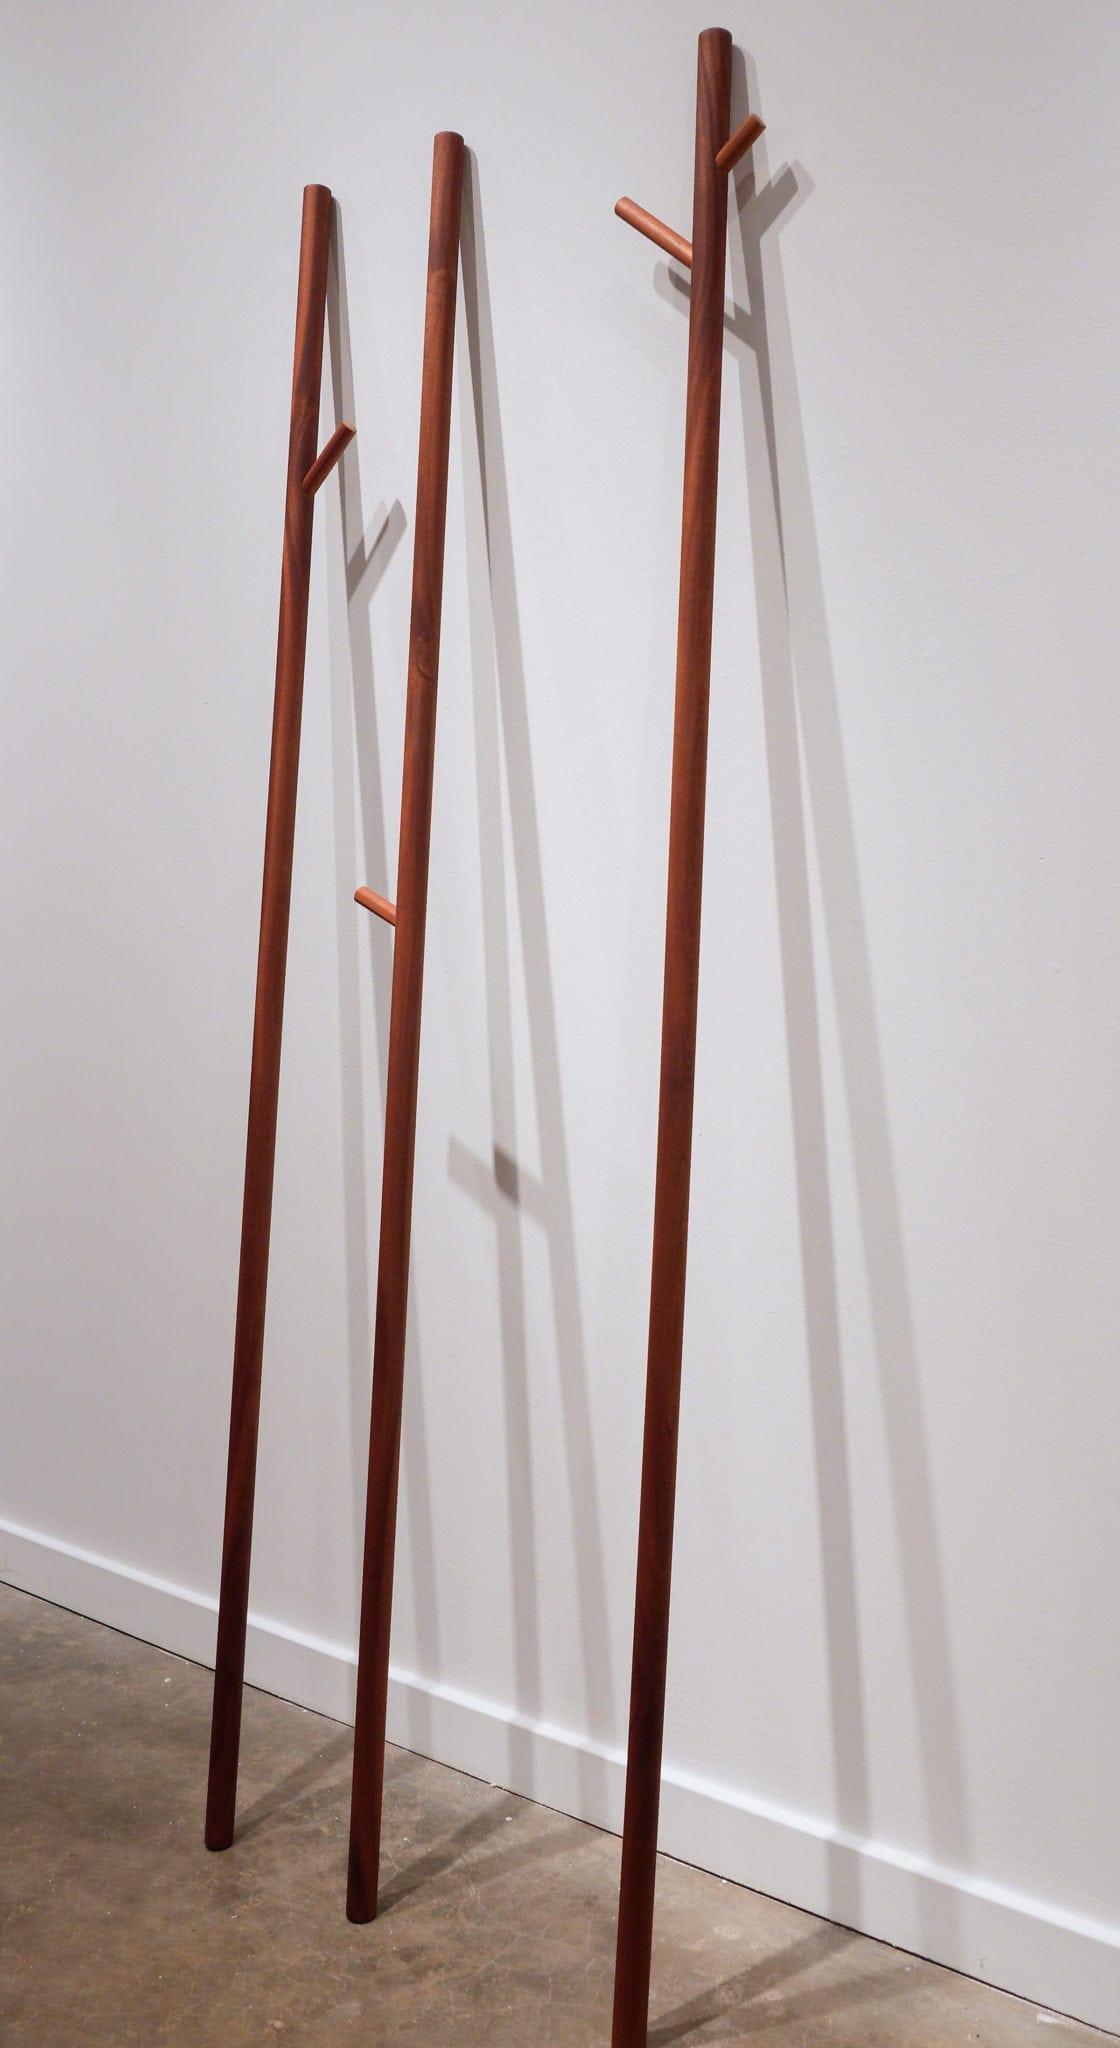 """MB315,"" wood. Photo courtesy Sandler Hudson Gallery."